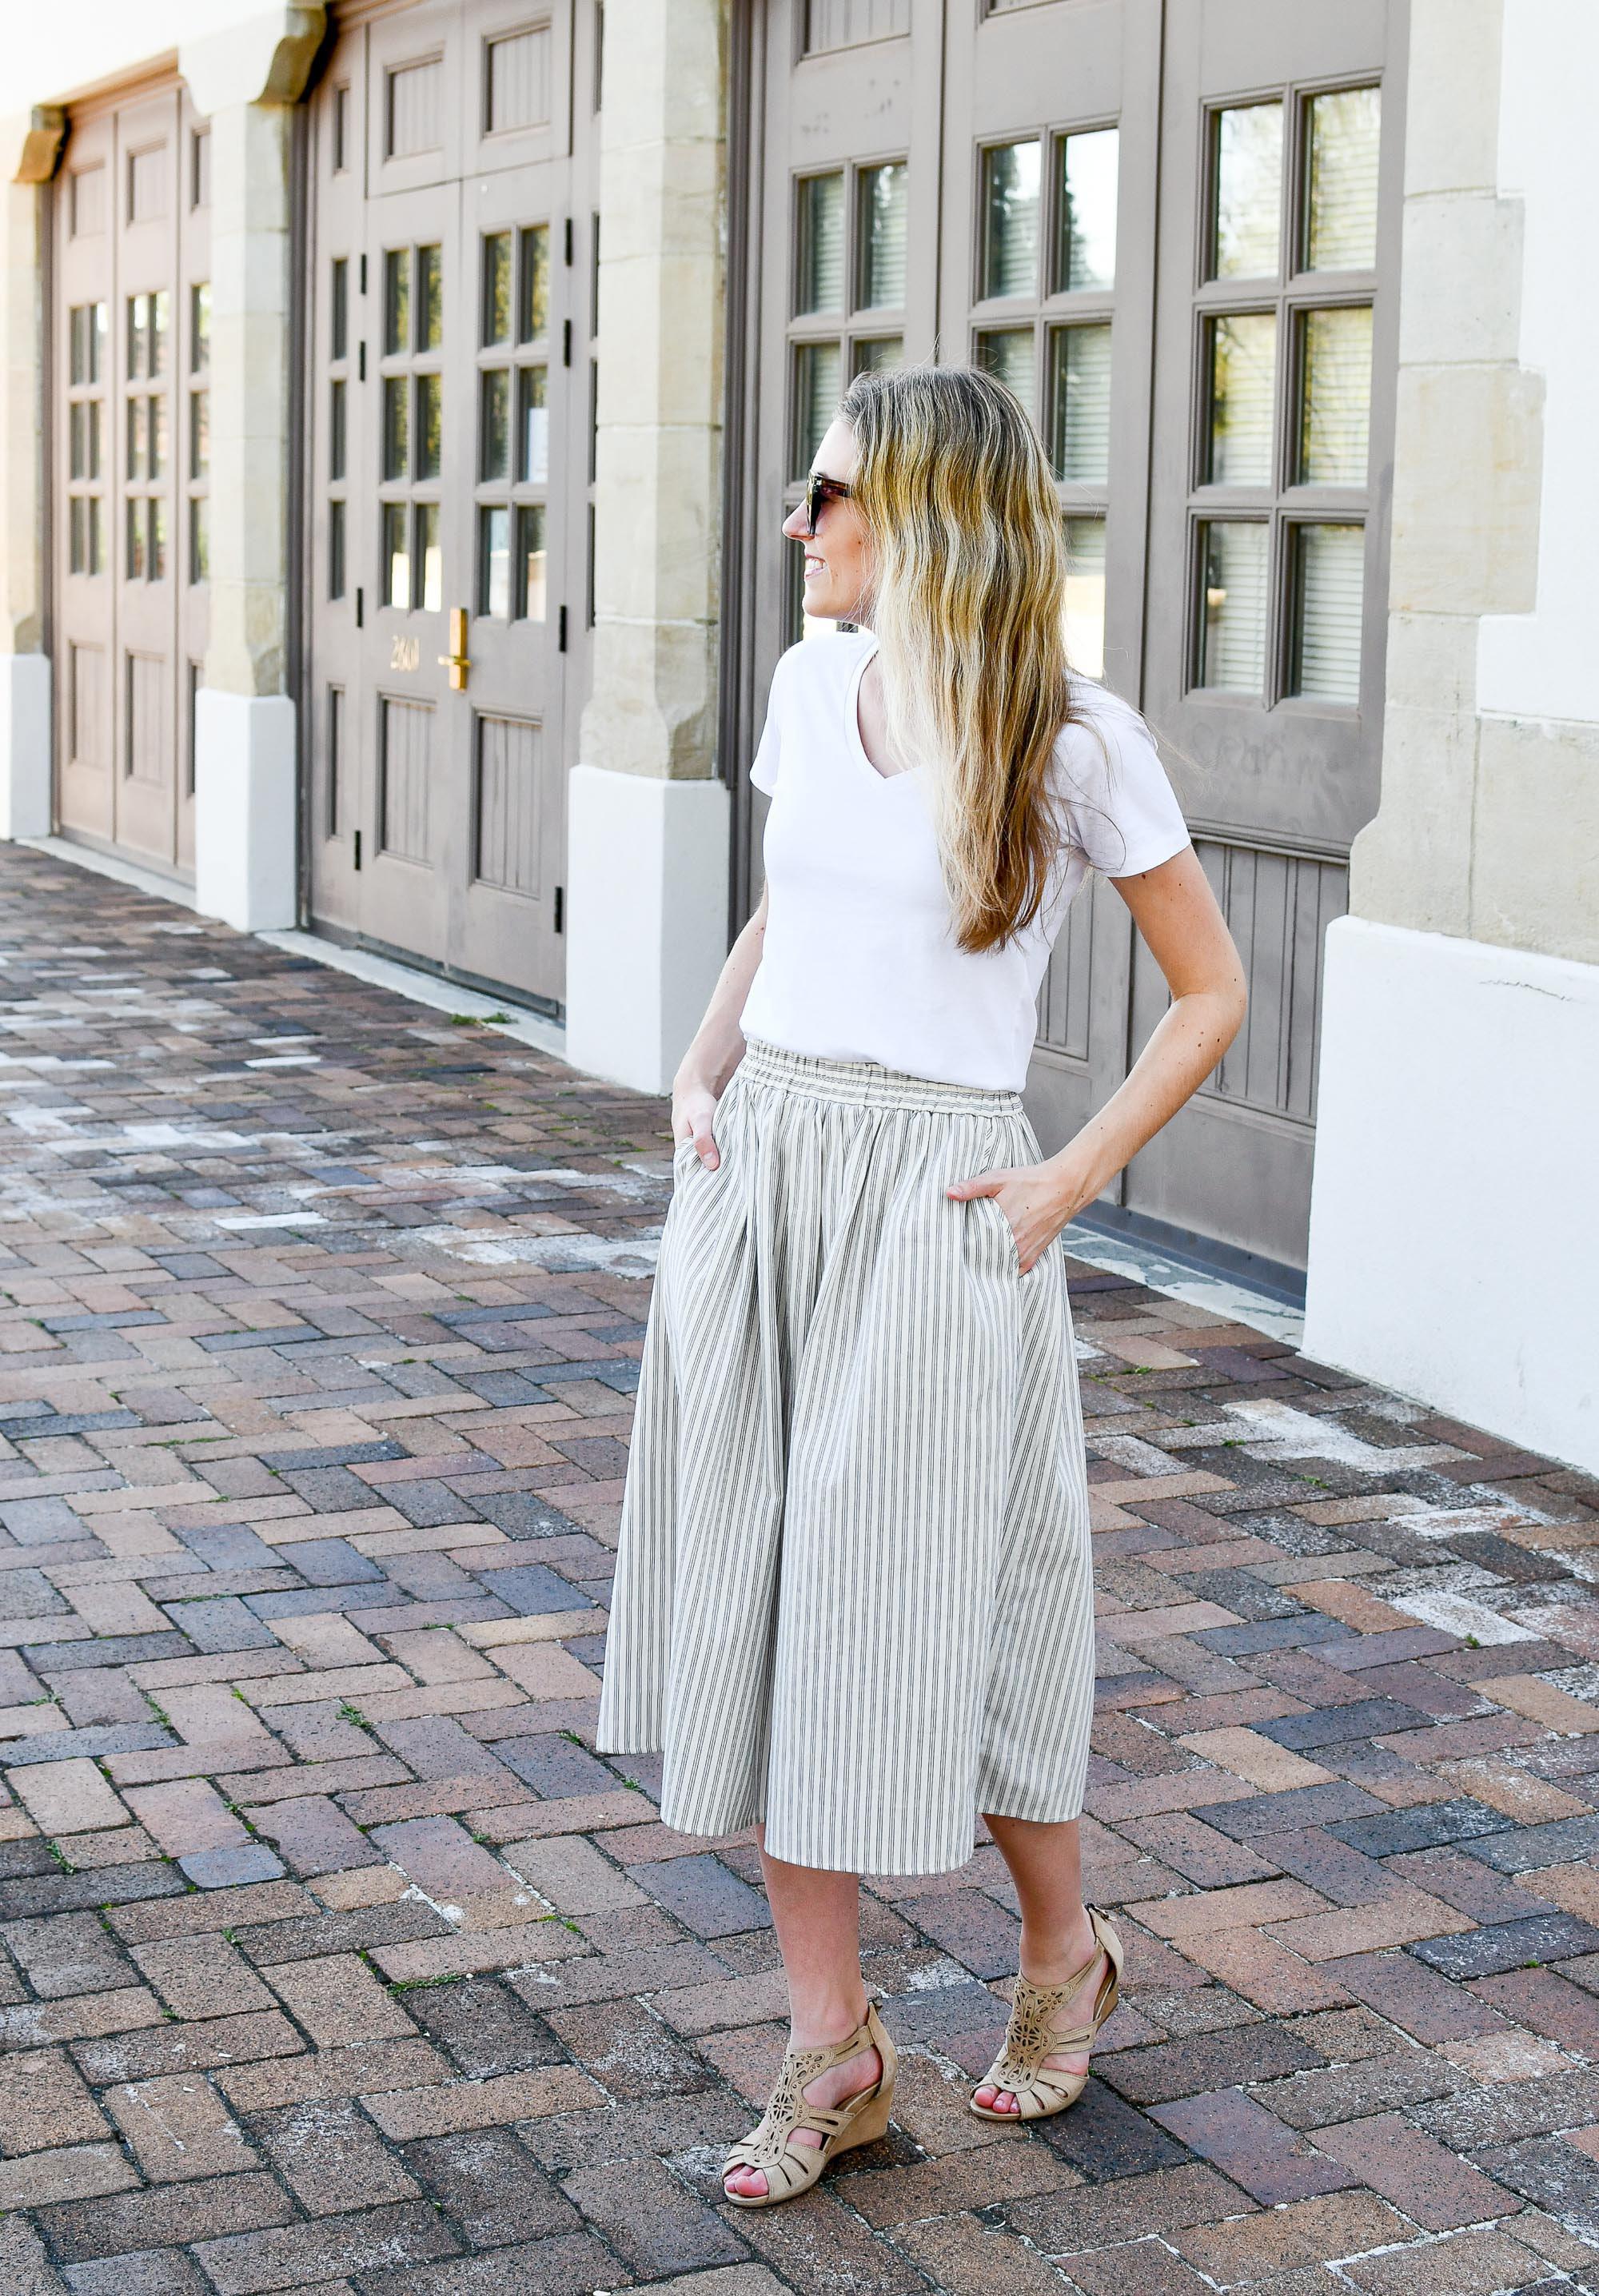 Amour Vert Greta midi skirt outfit — Cotton Cashmere Cat Hair